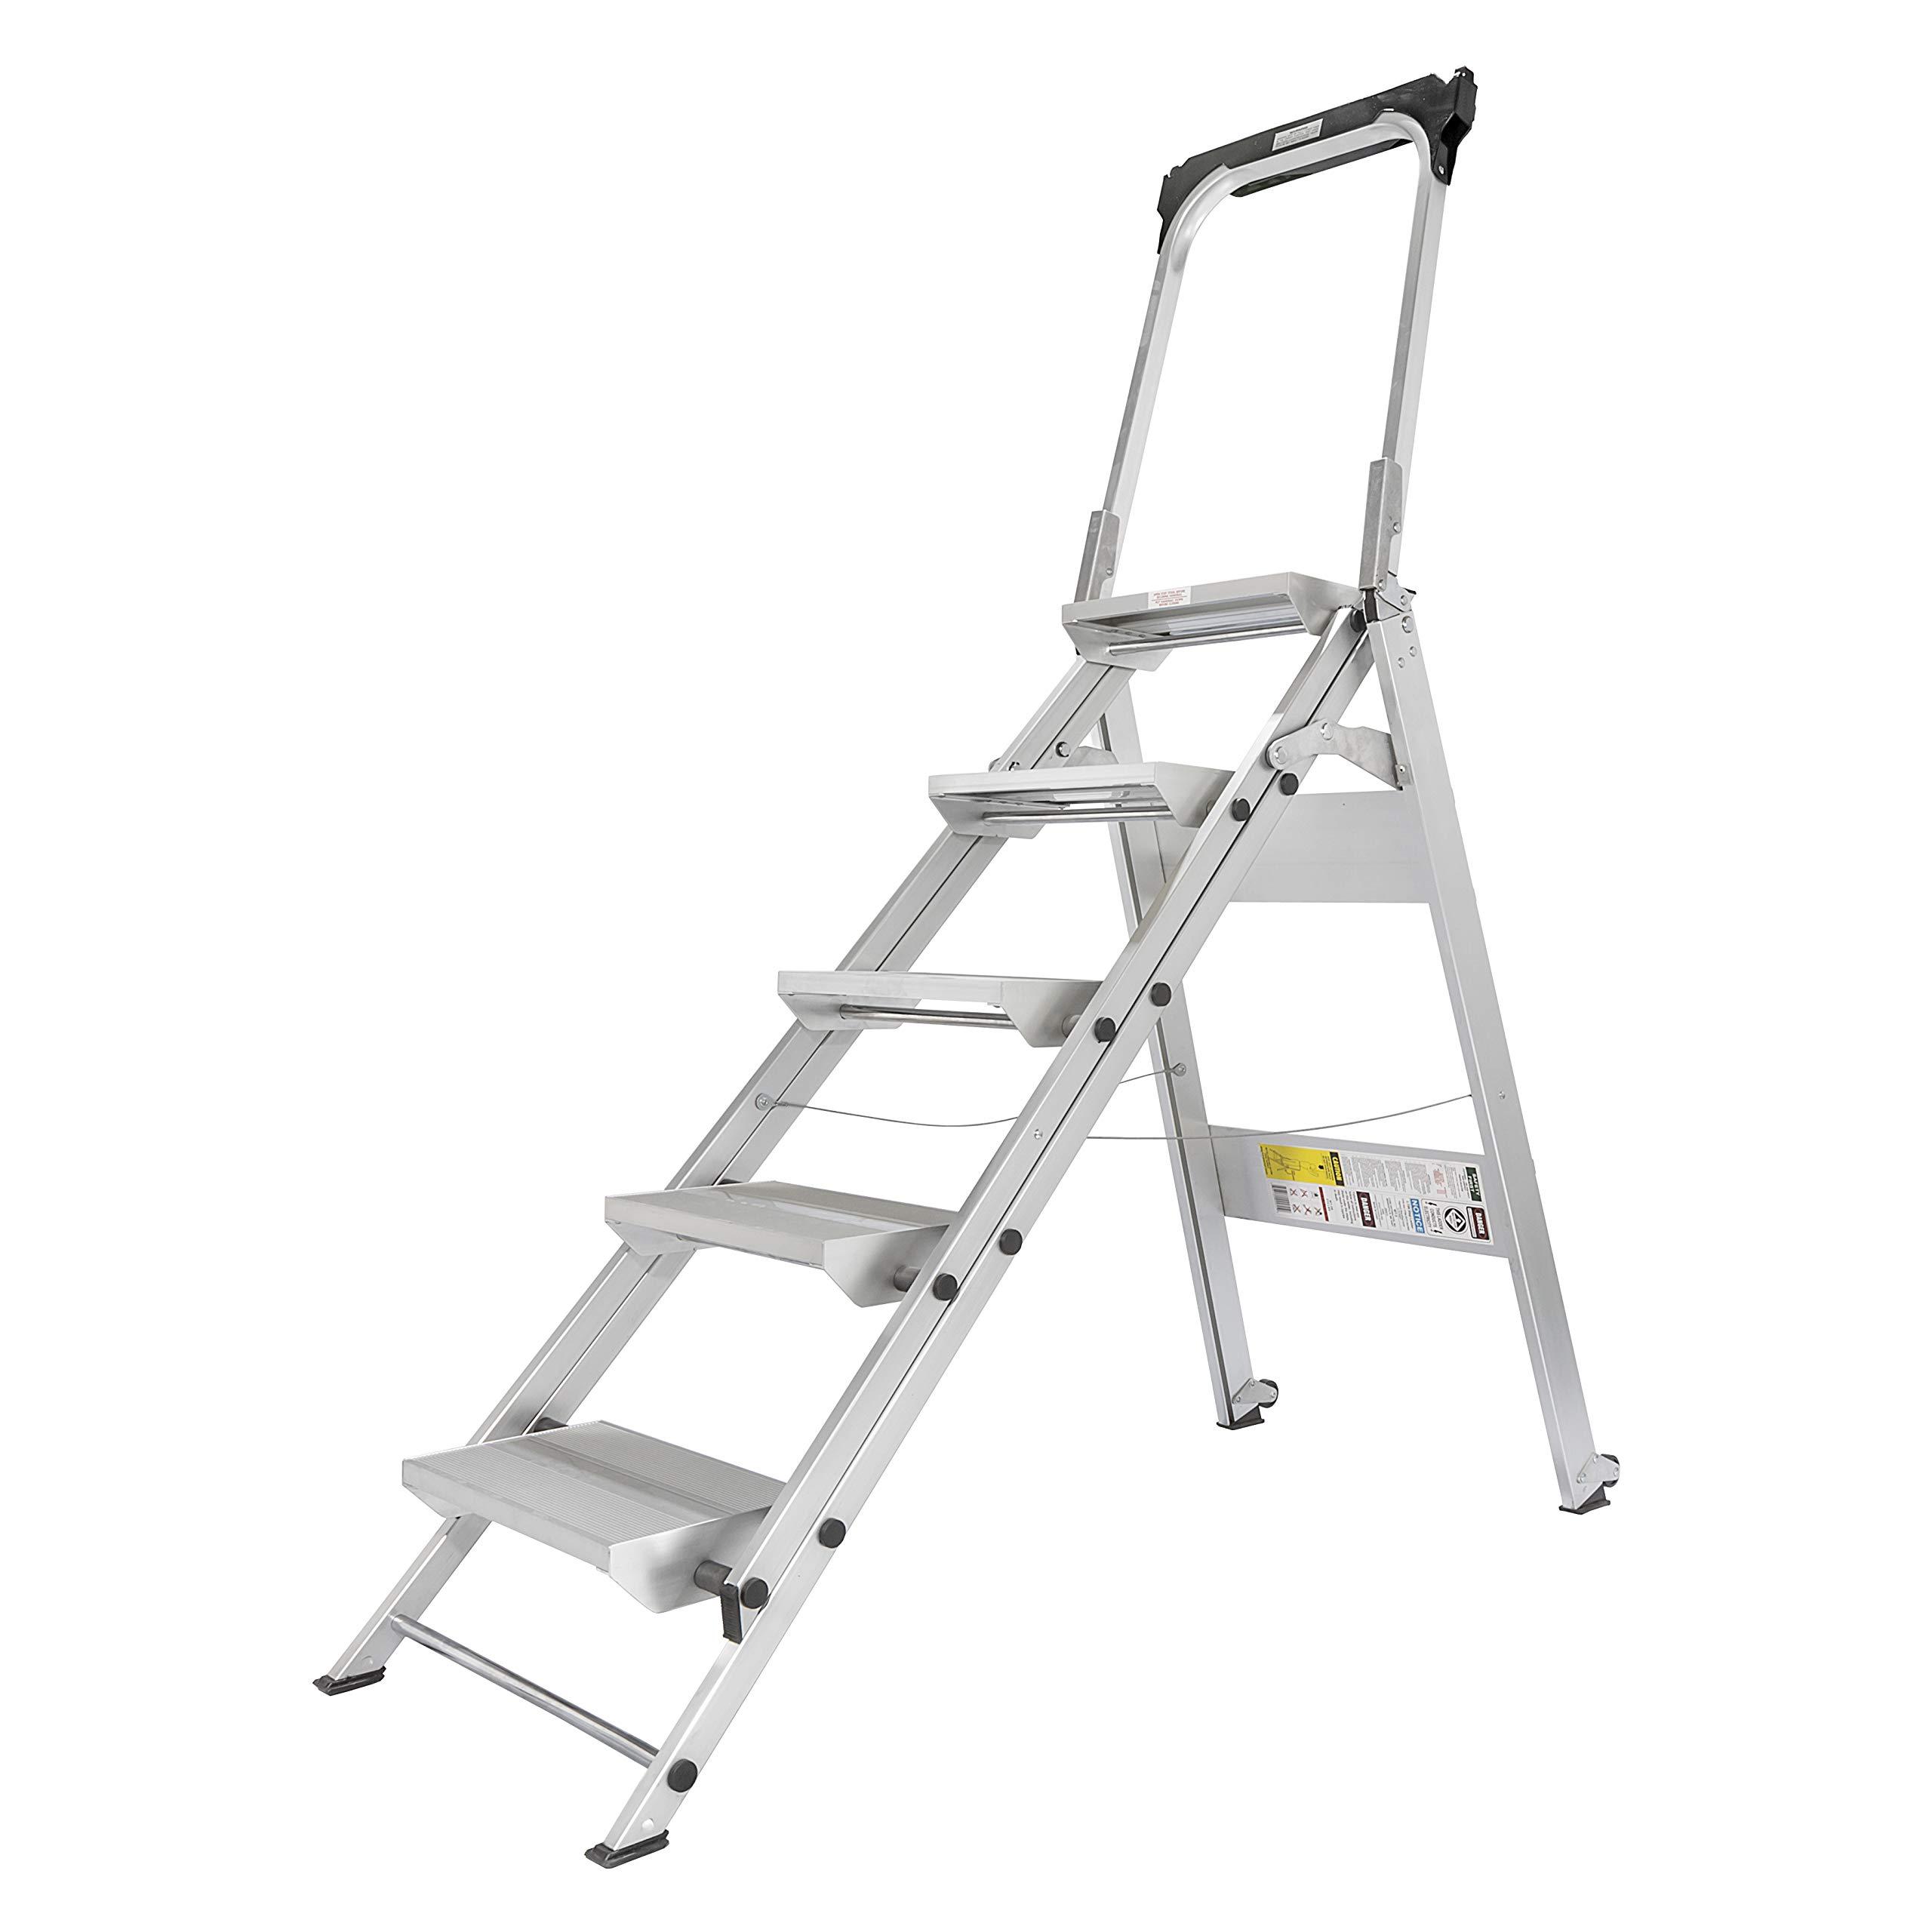 Xtend & Climb WT5 Professional Series Folding Step Stool with Handrail, 5-Step by Xtend & Climb